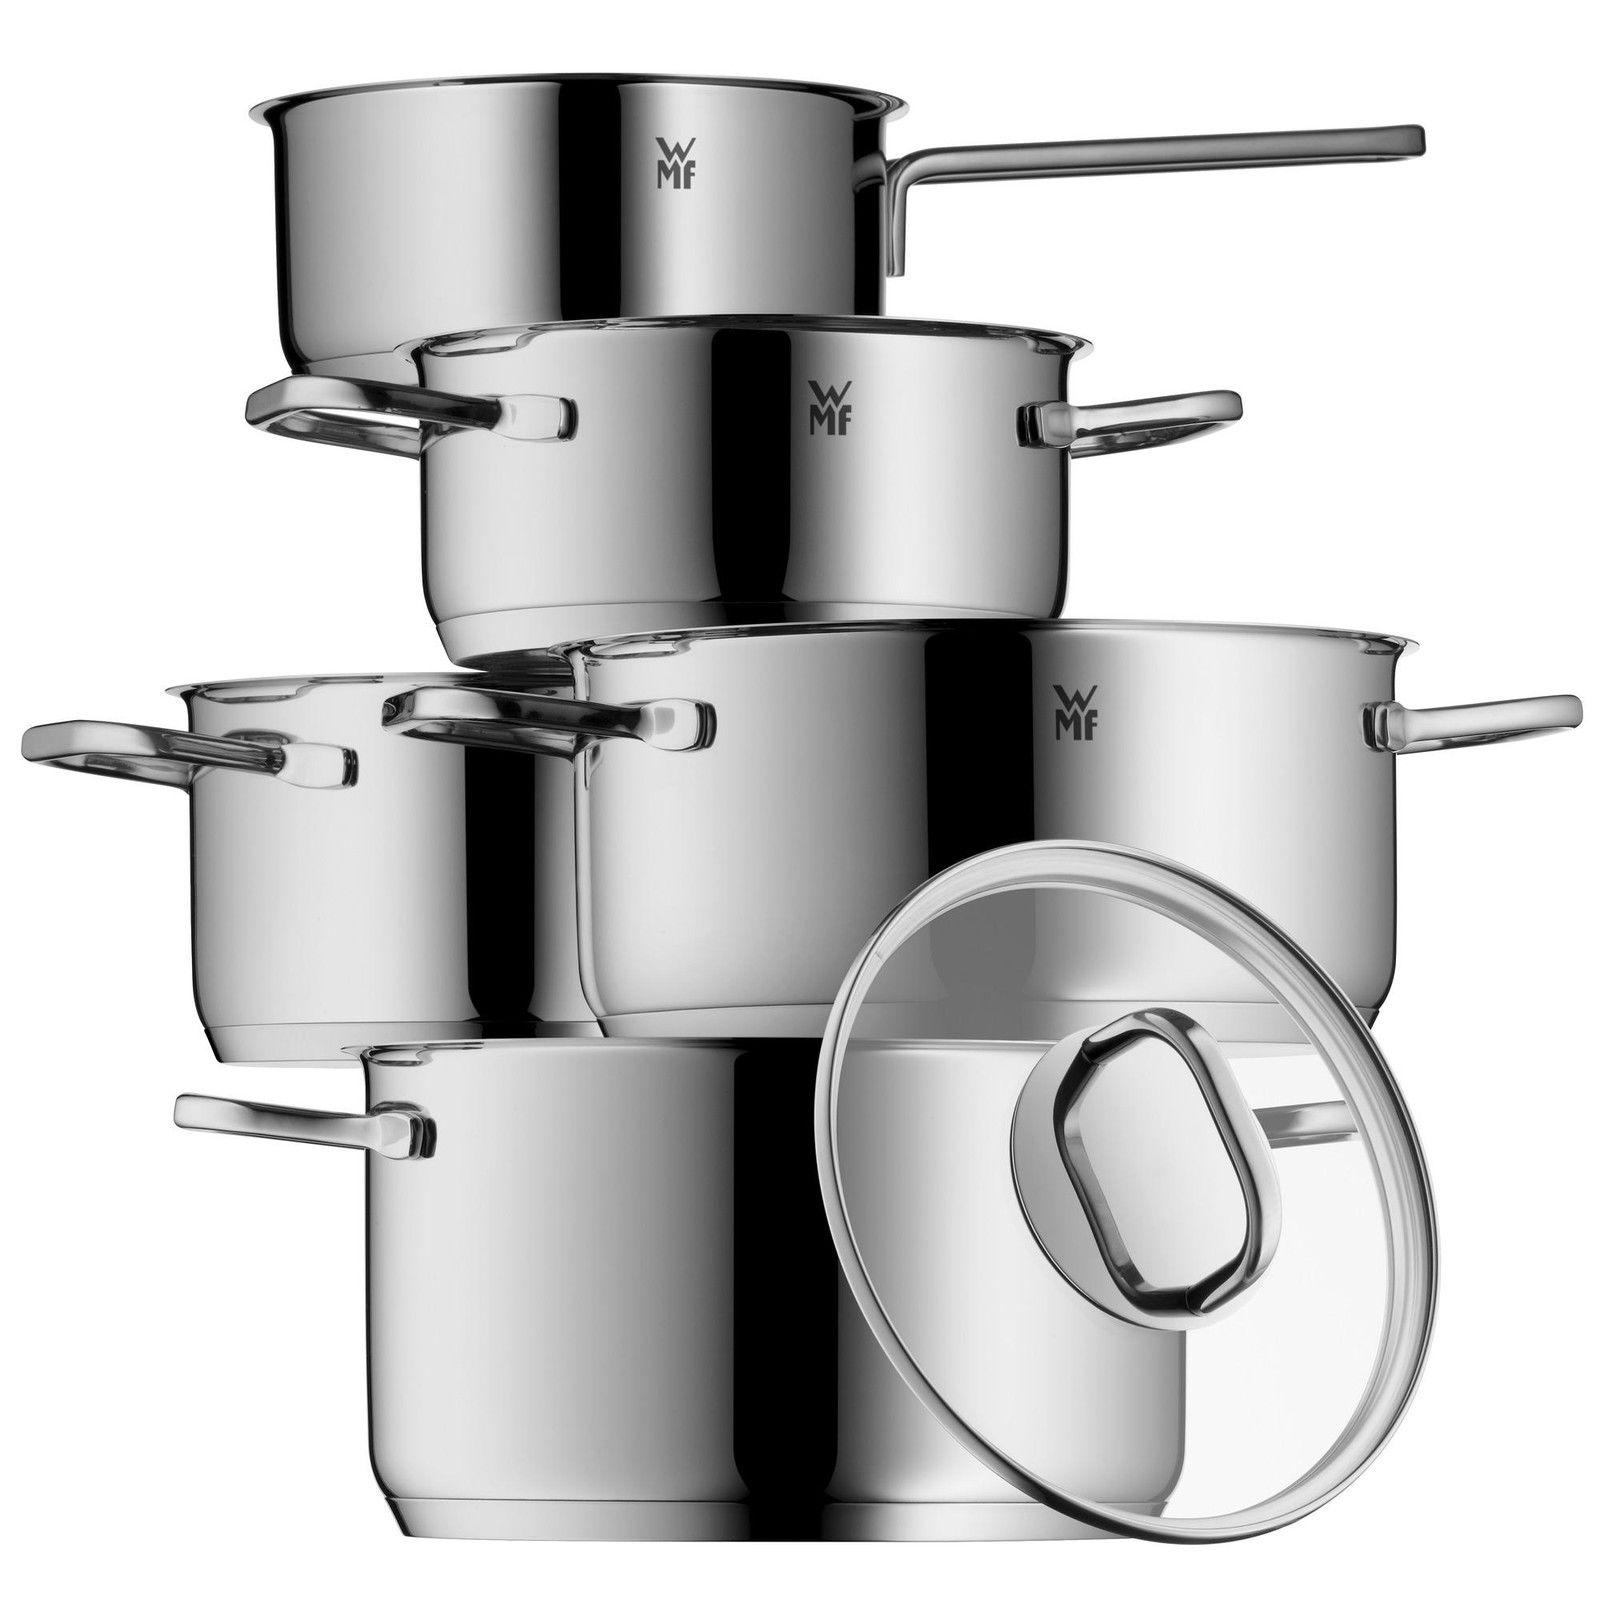 WMF Topf-Set 5-teilig Intension Schüttrand Cromargan® Edelstahl NEU